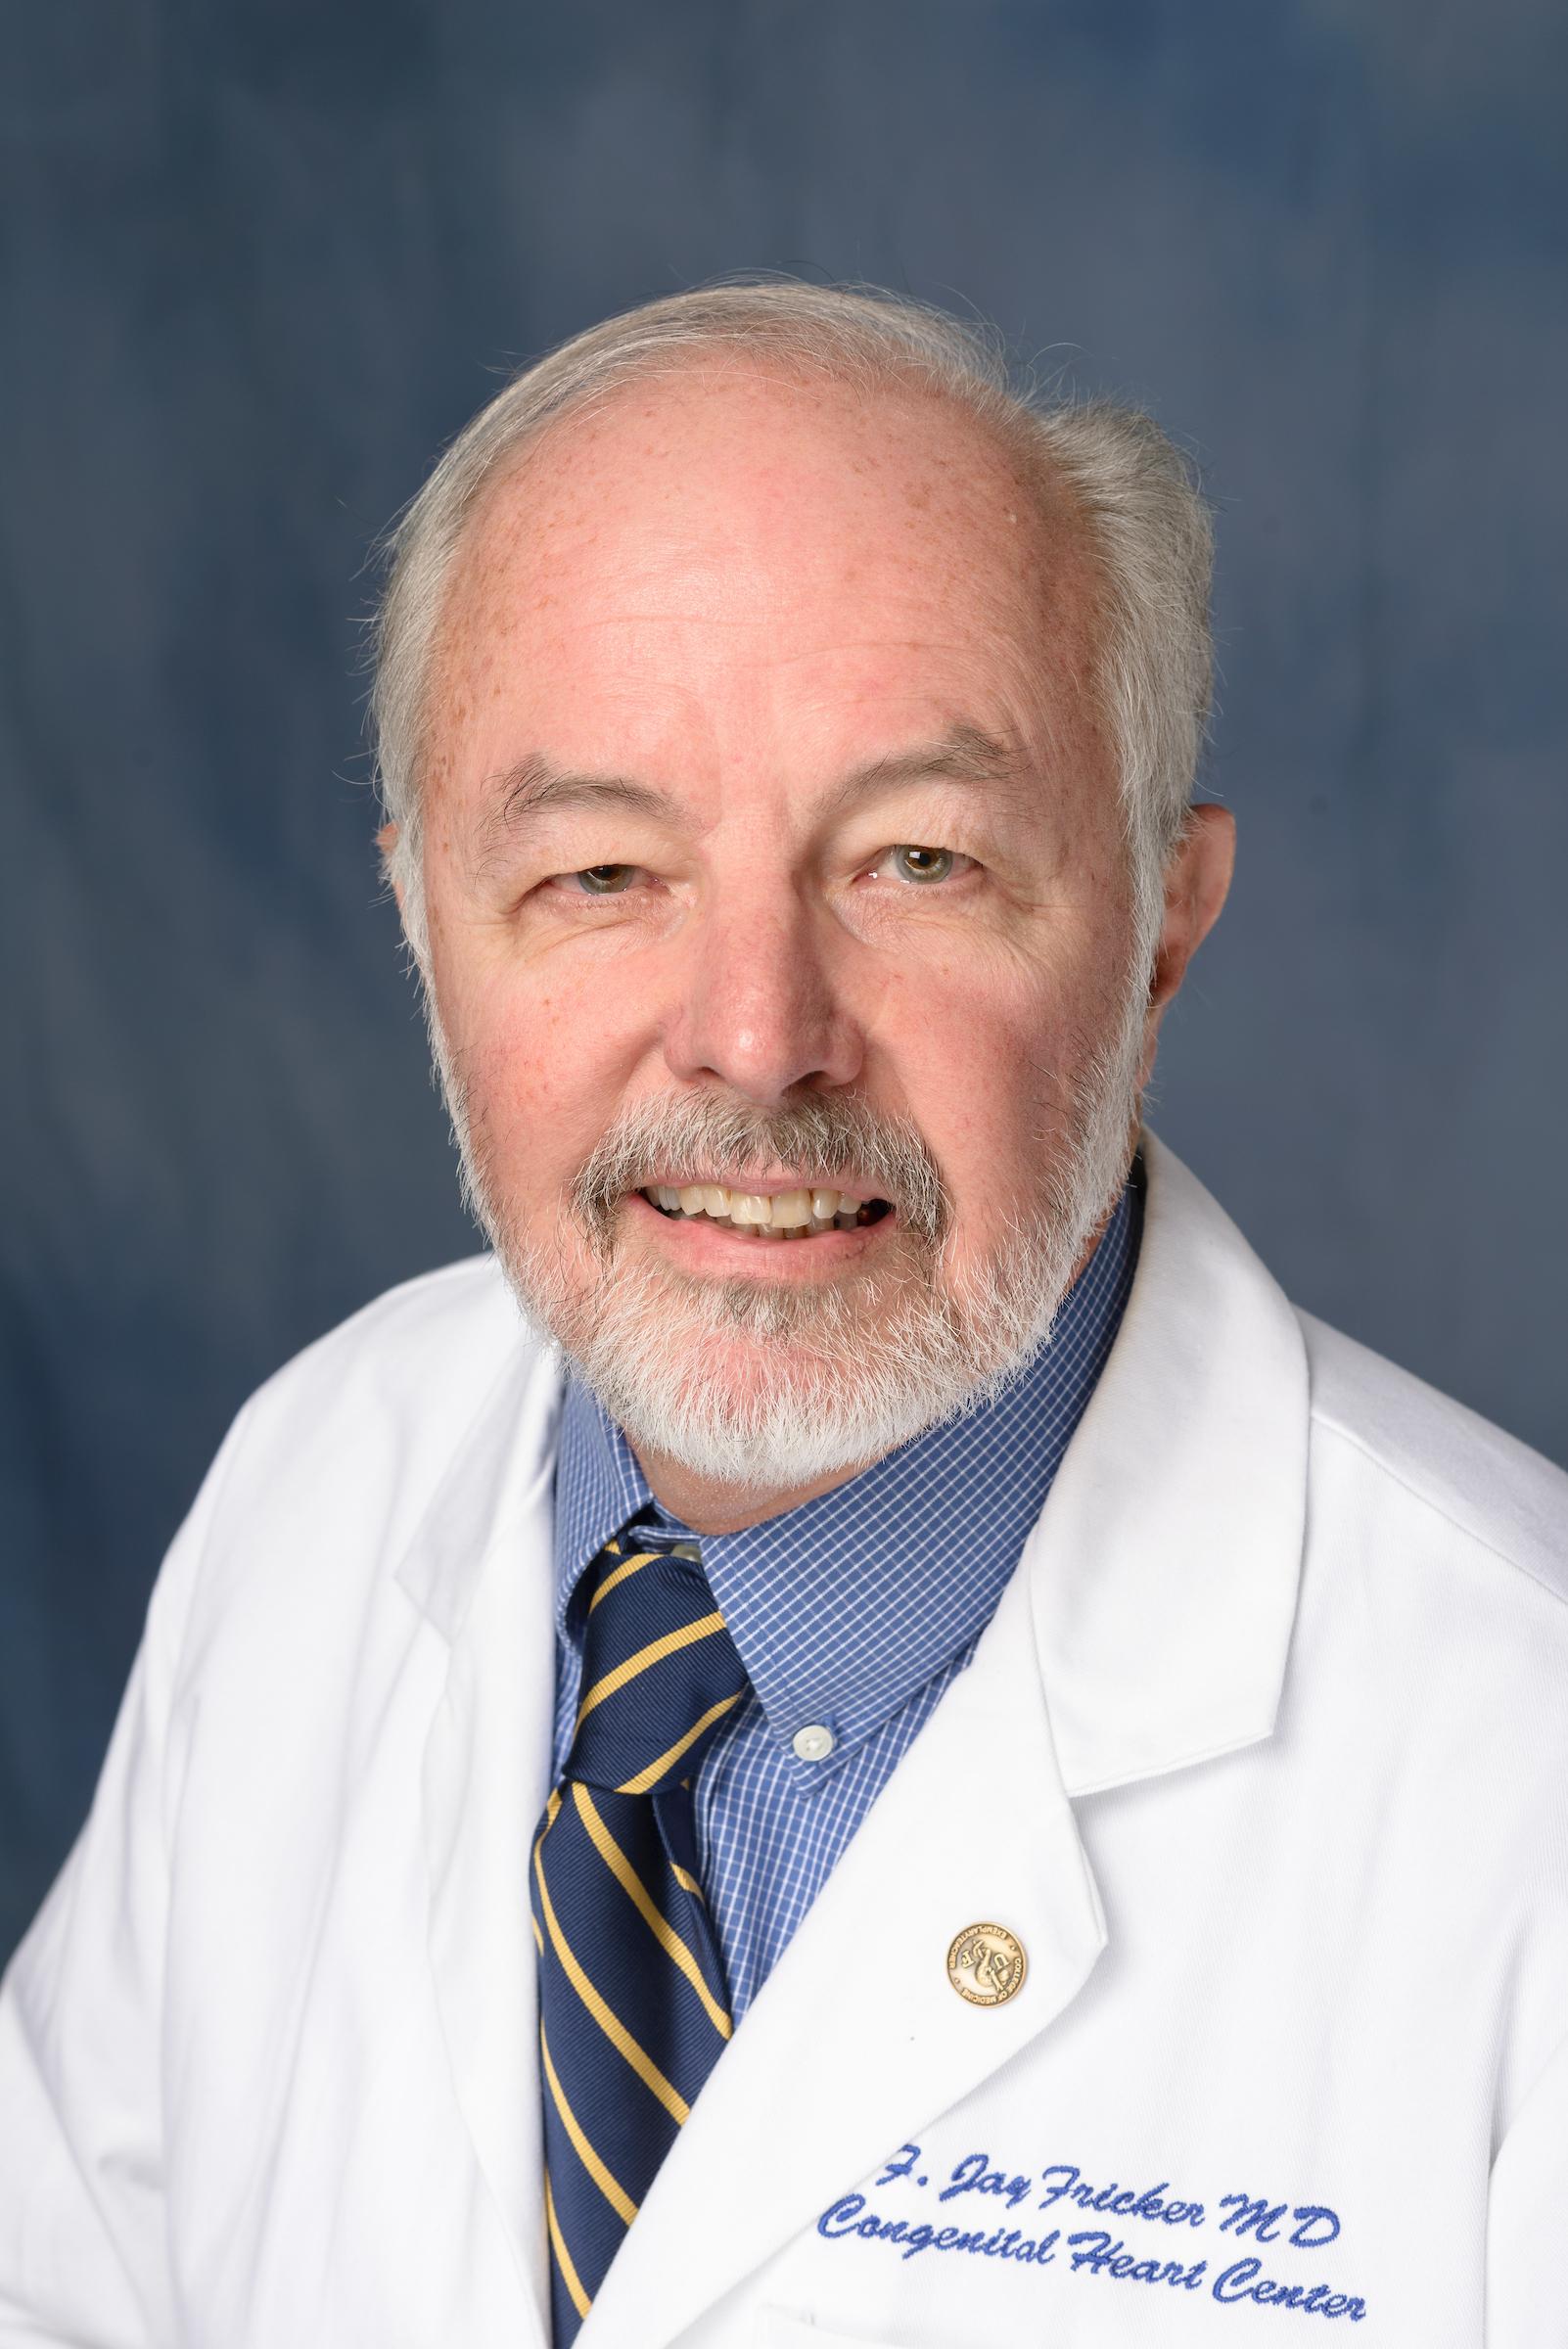 F. Jay Fricker, MD